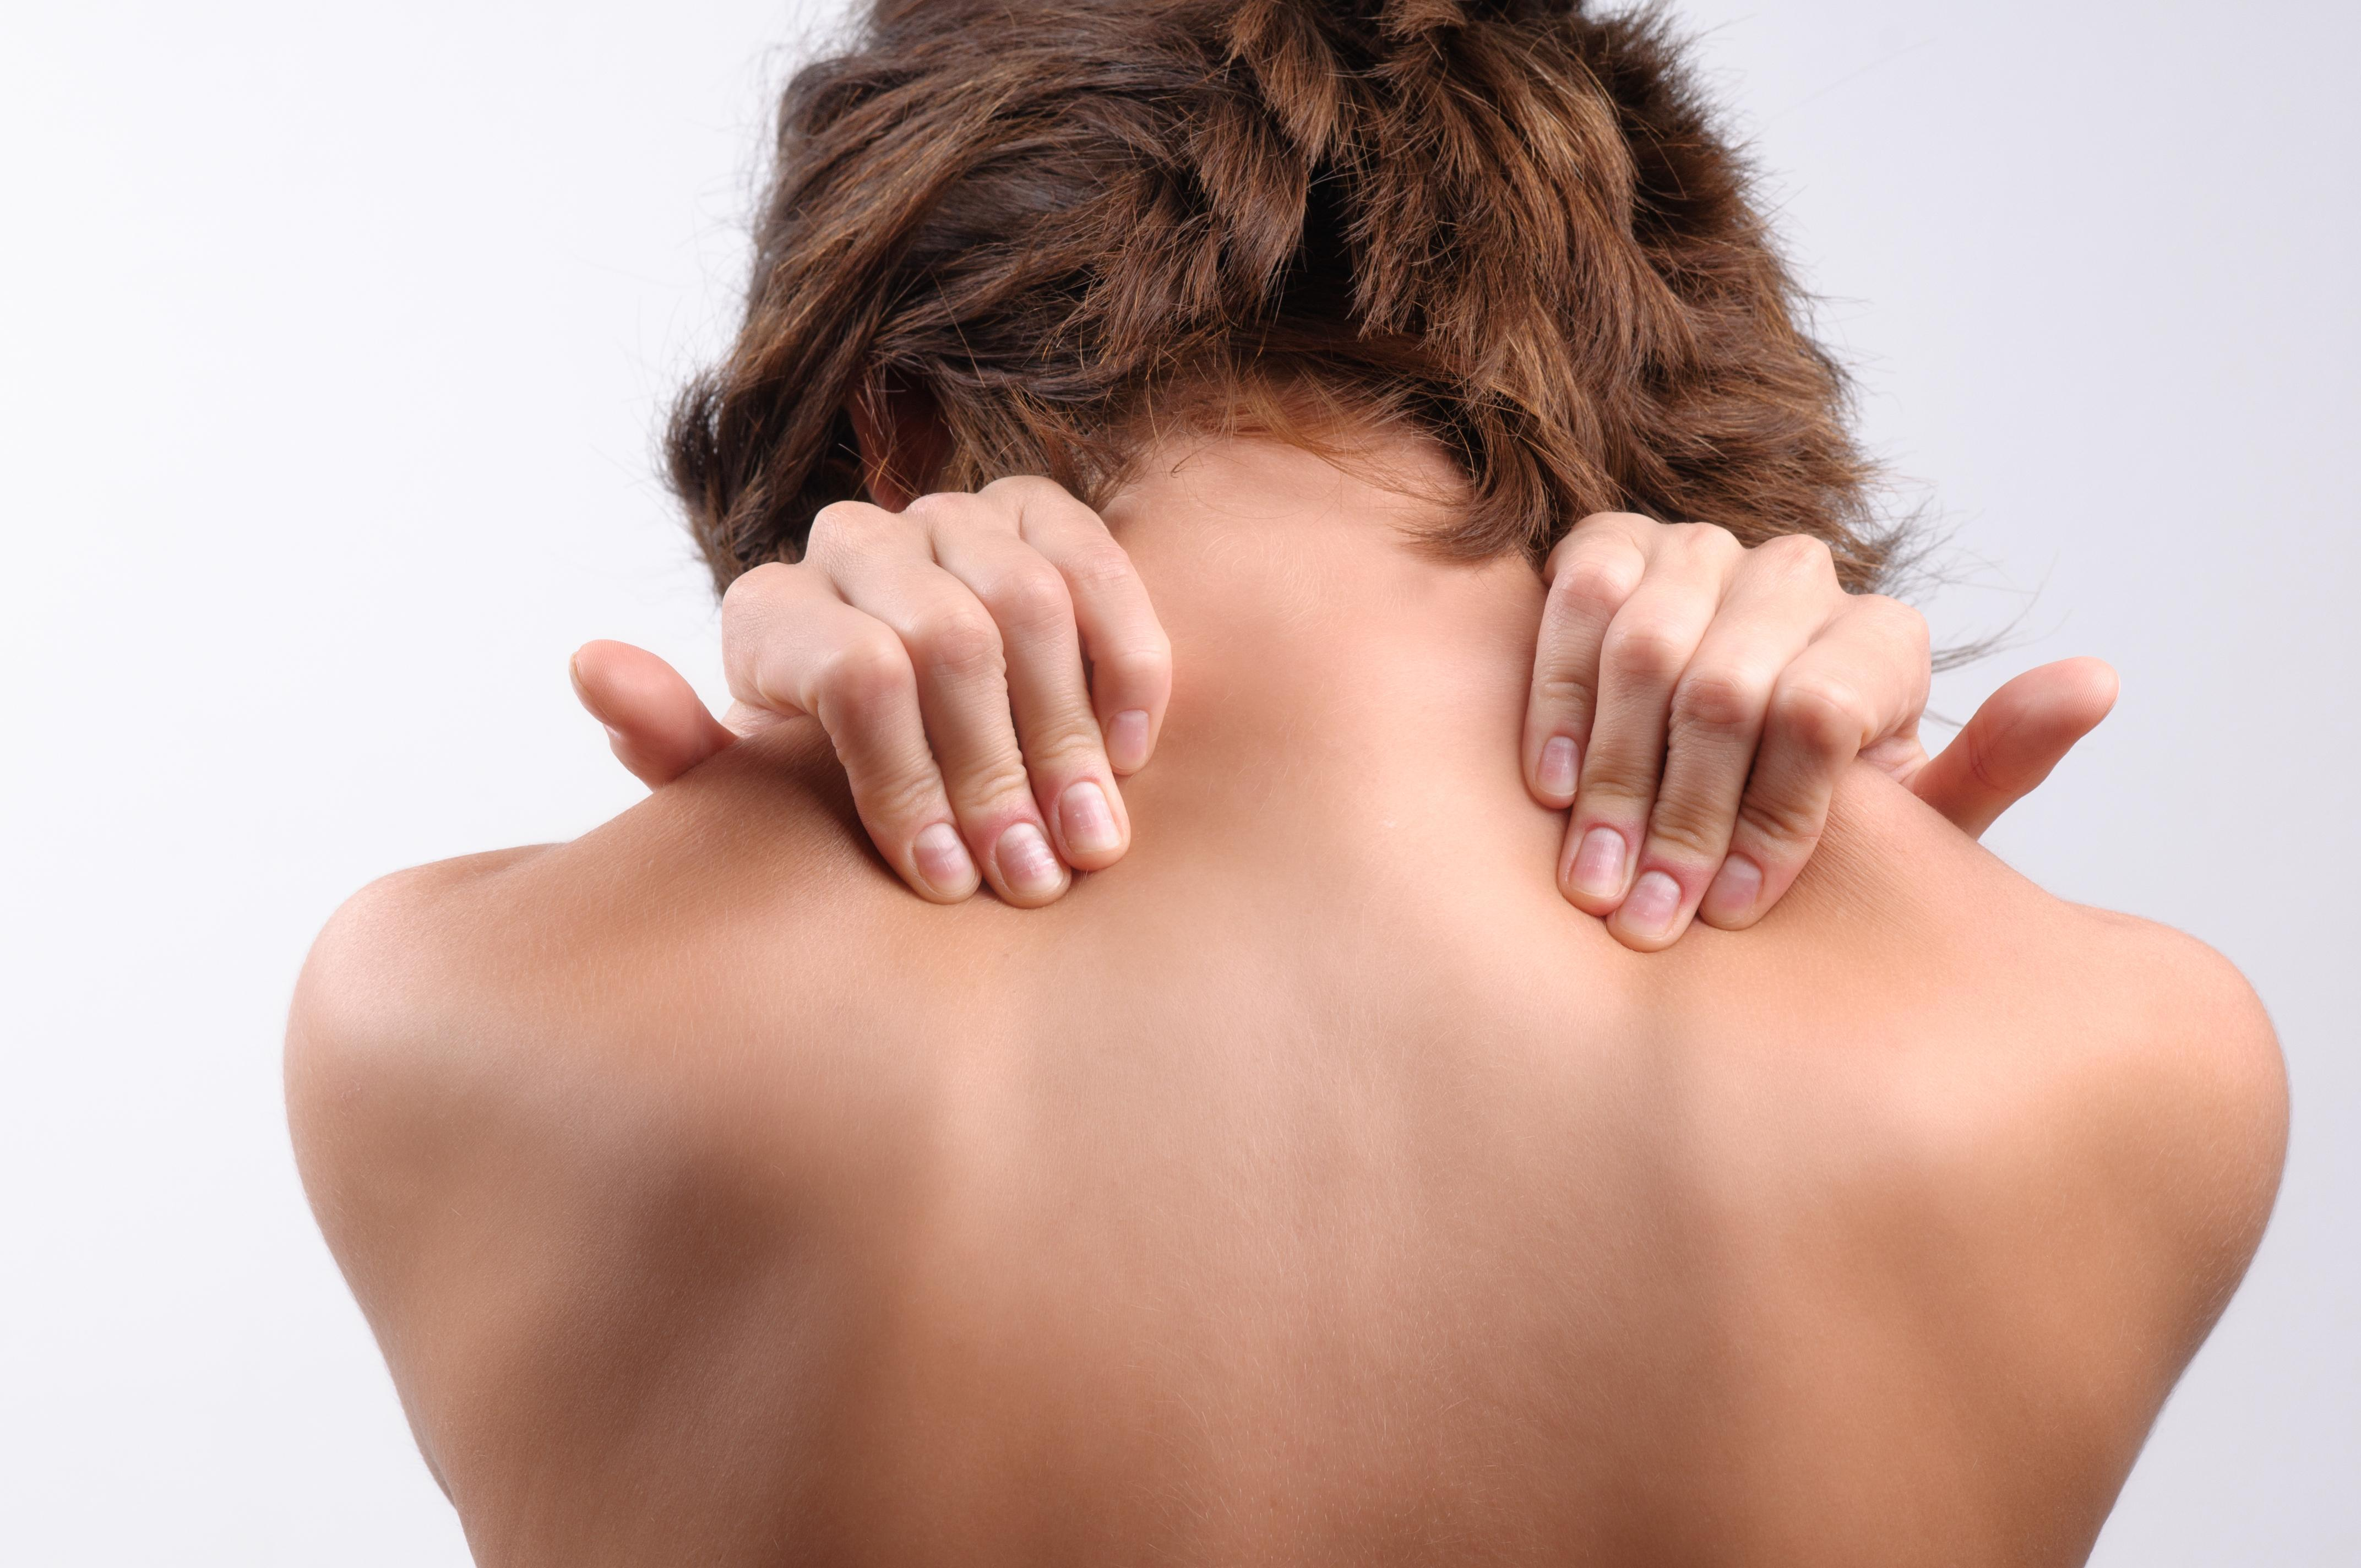 Exercícios para Dor no Ombro